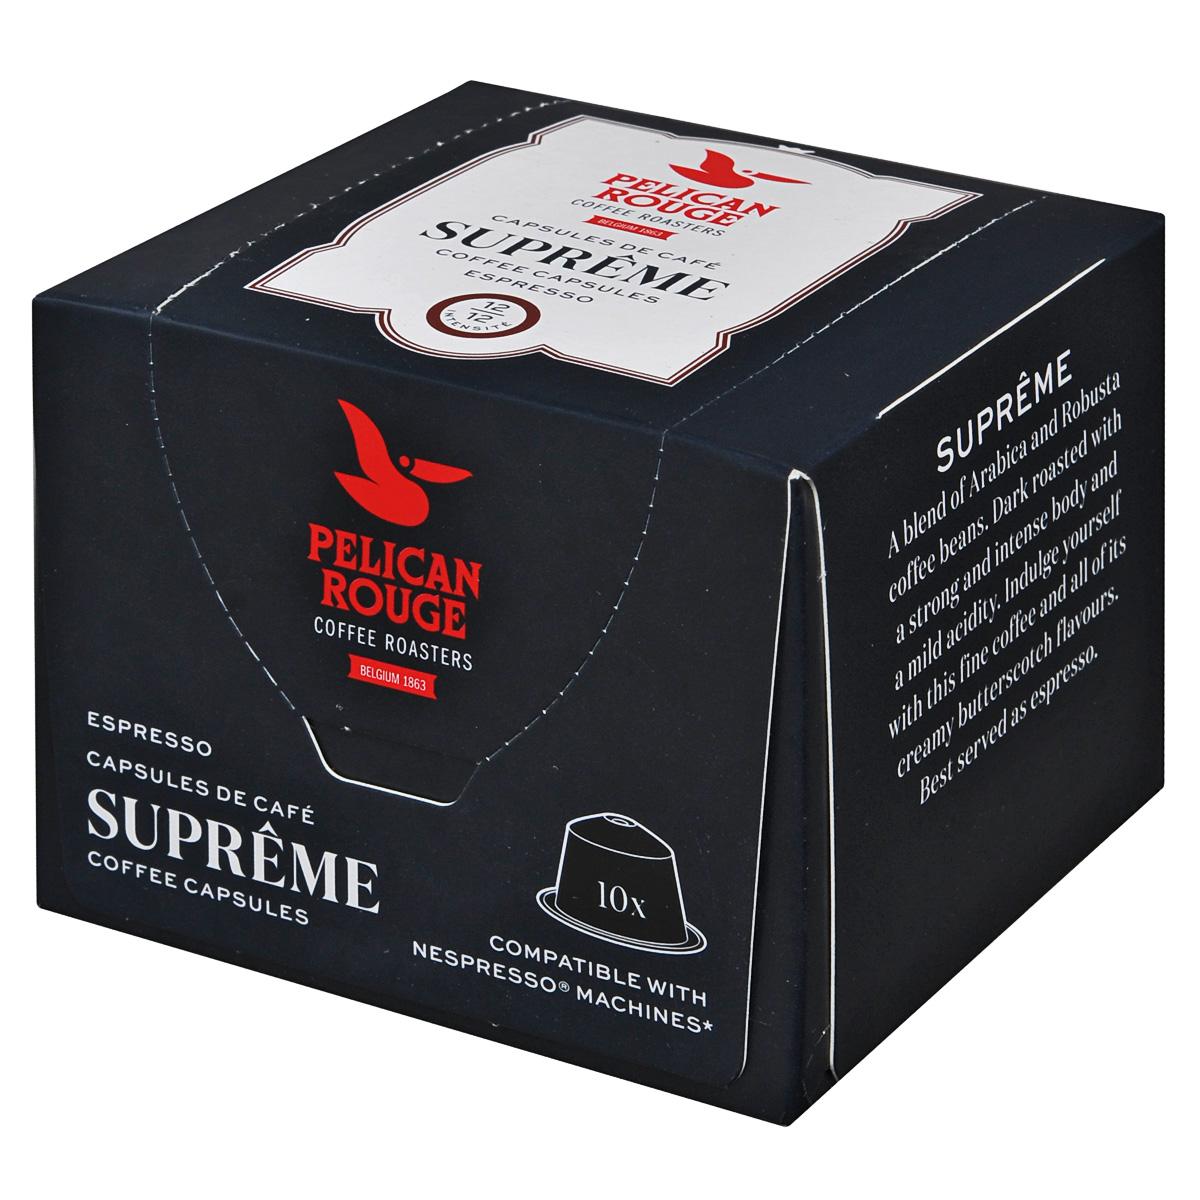 Pelican Rouge Supreme кофе в капсулах, 10 шт professo gurme кофе в капсулах 8 шт